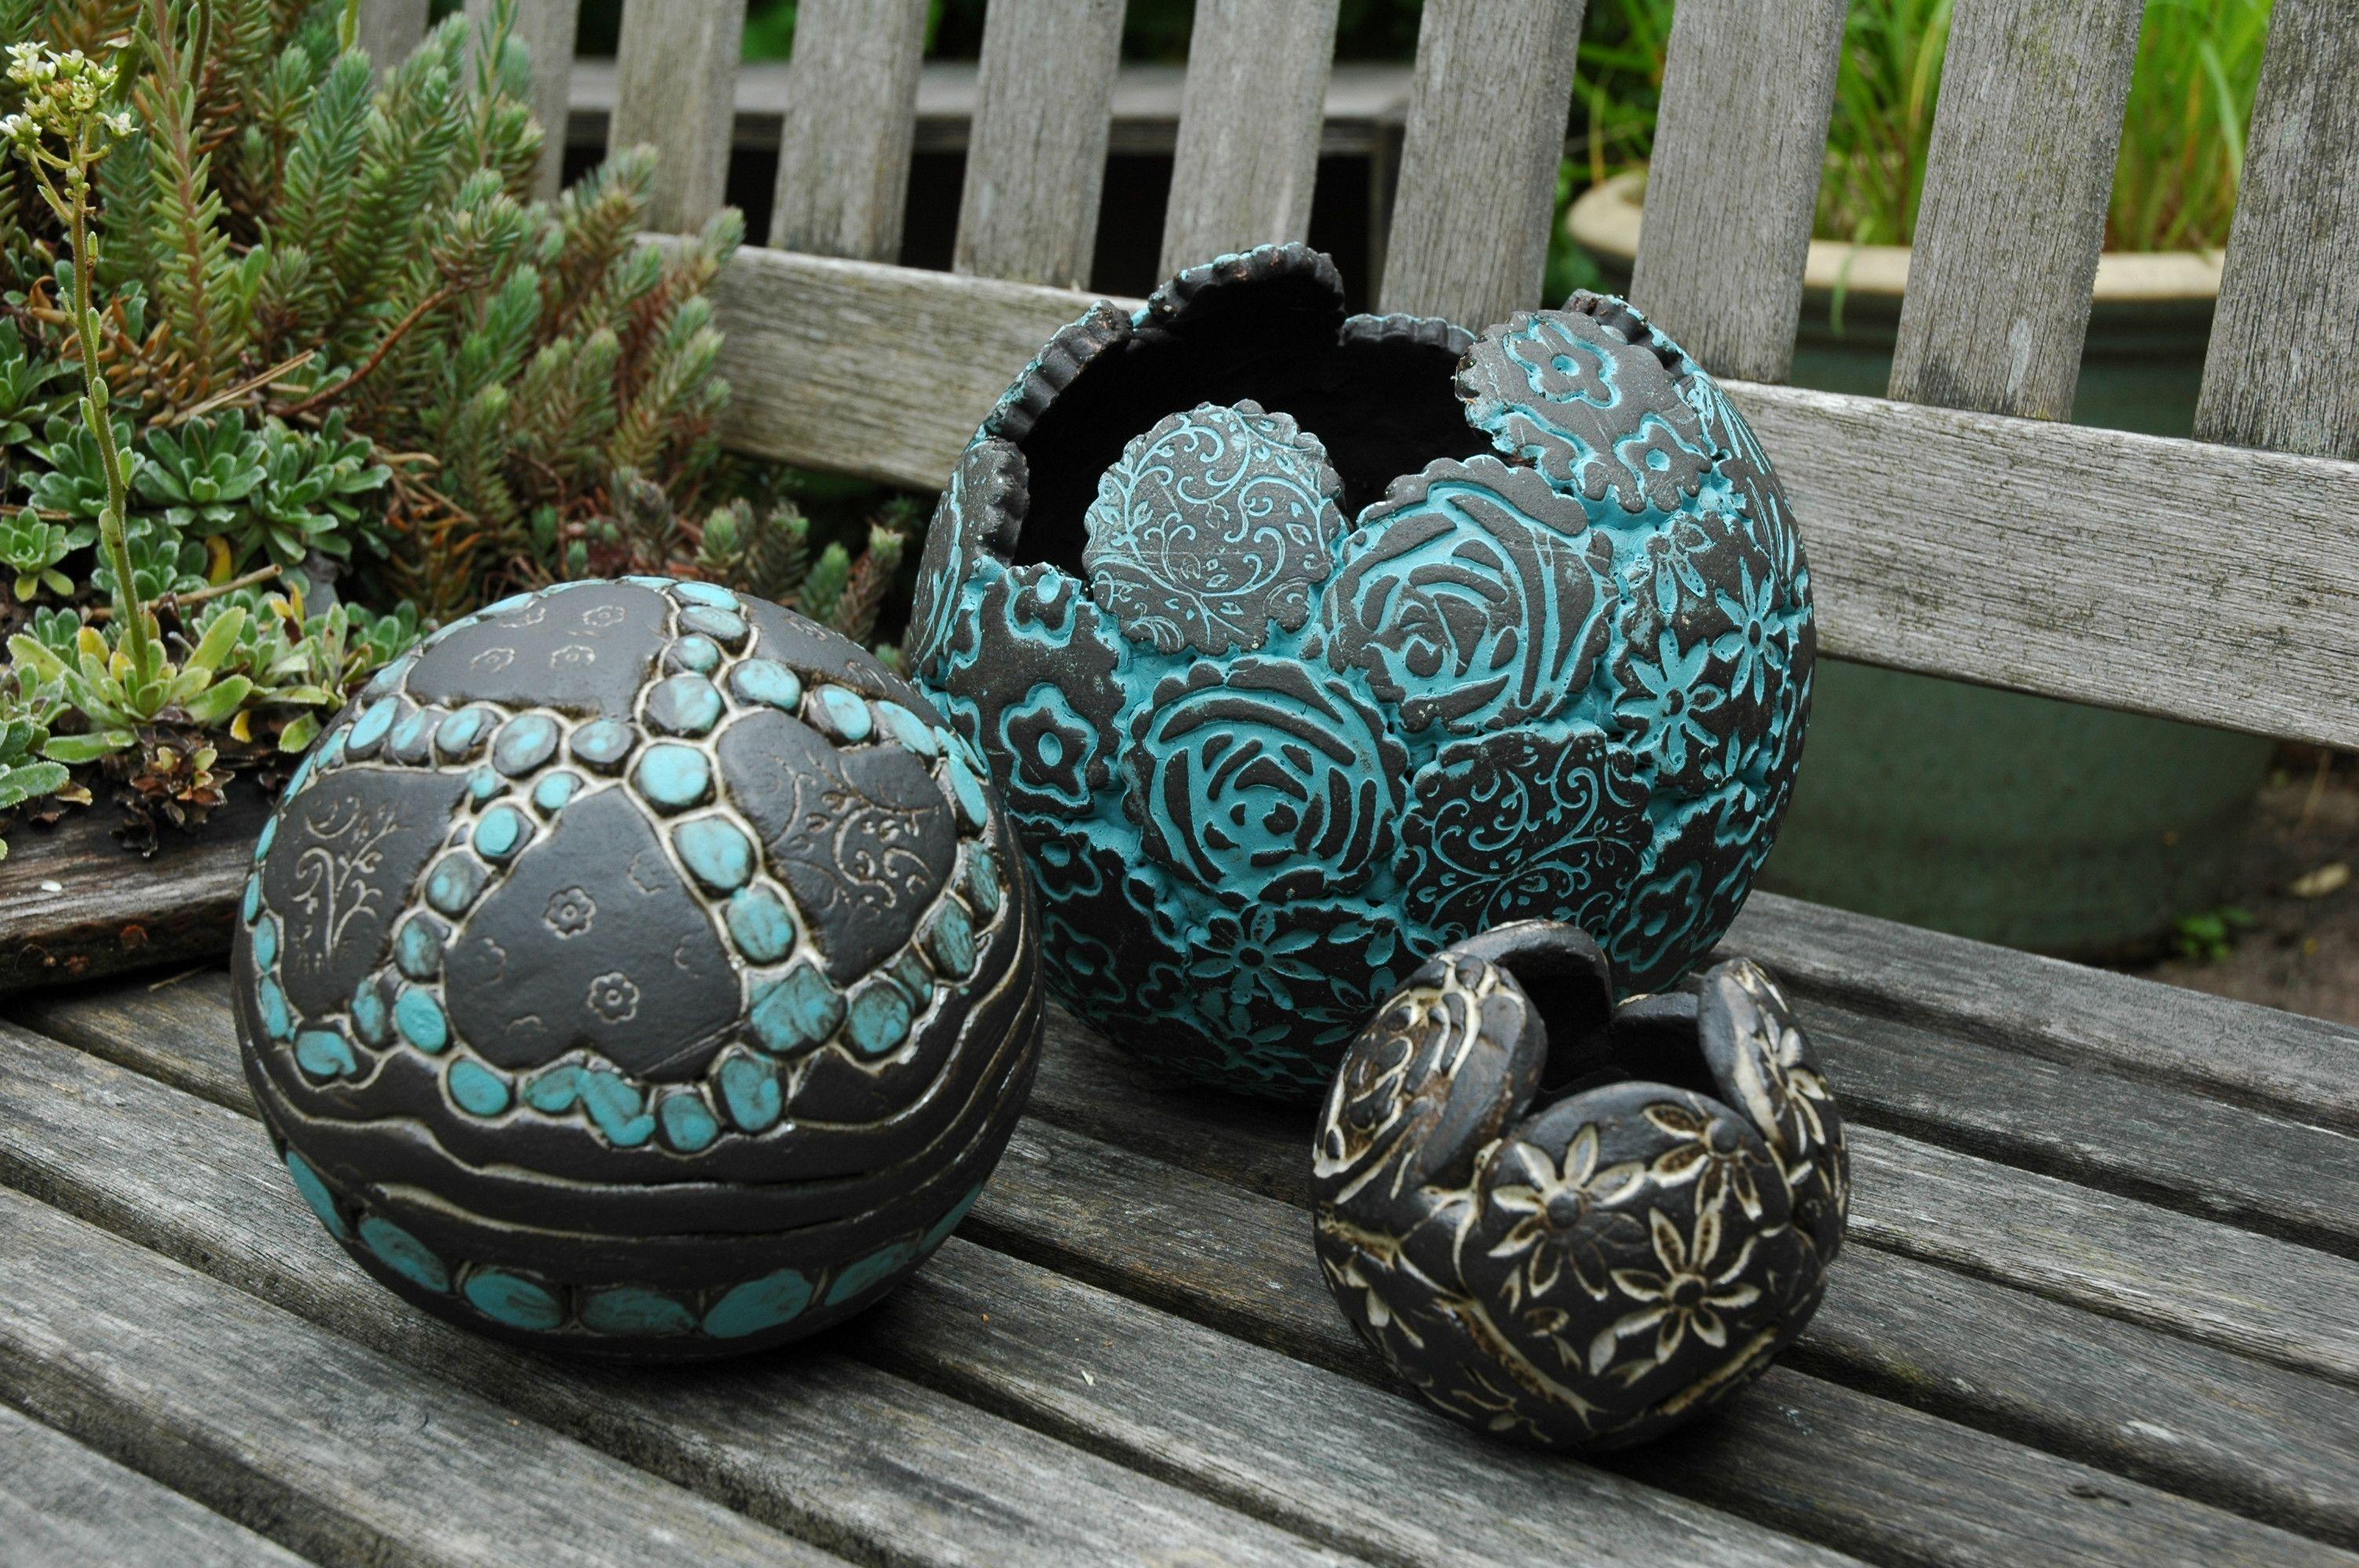 gartenkeramik ceramique jardin pinterest. Black Bedroom Furniture Sets. Home Design Ideas